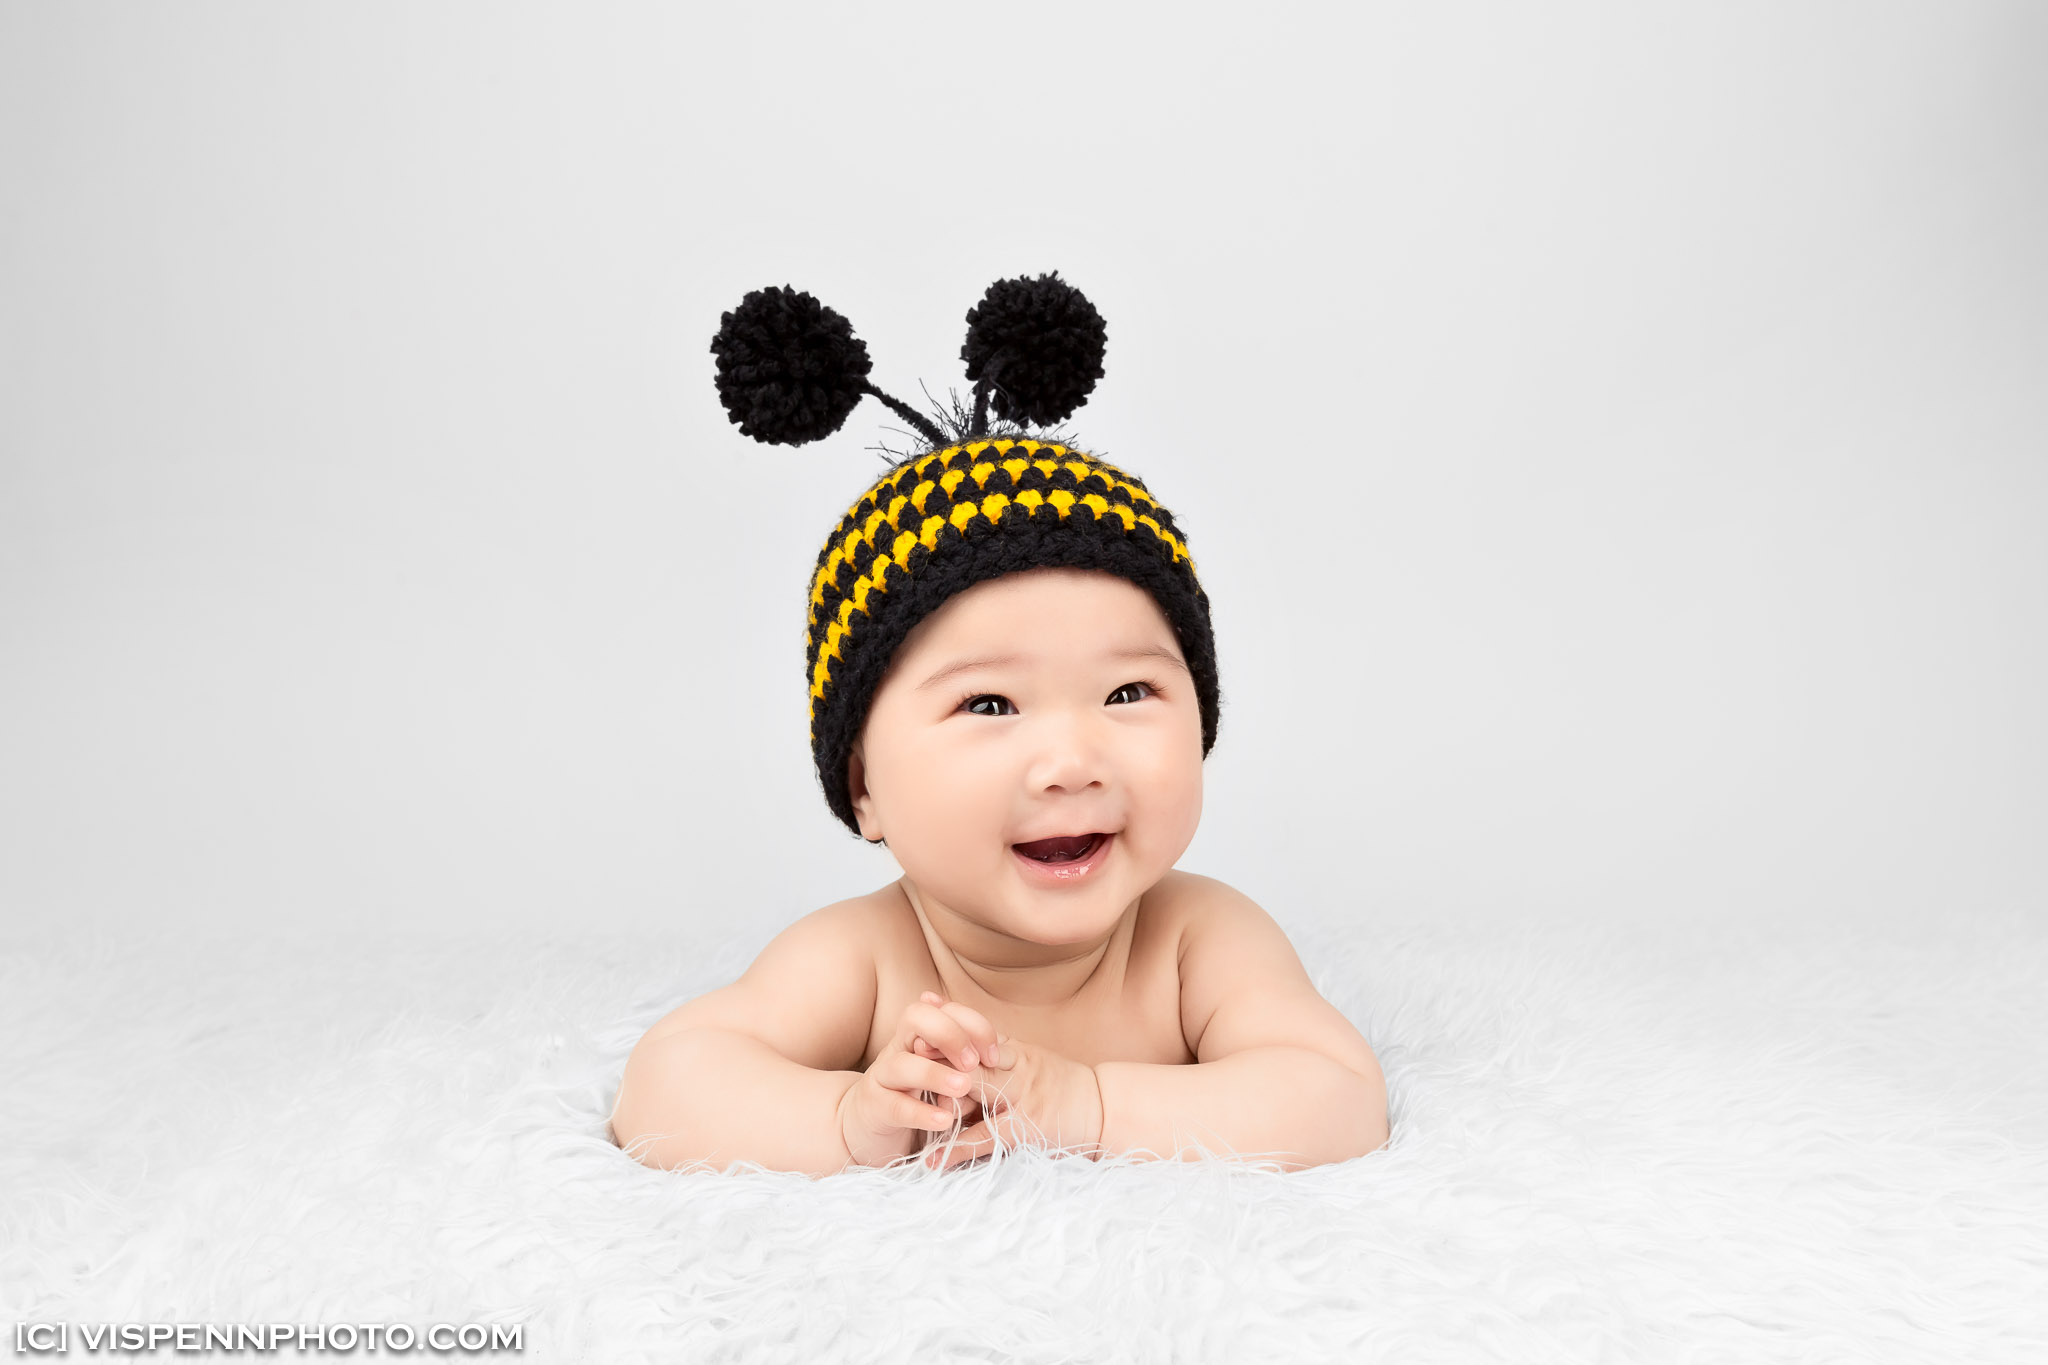 Melbourne Newborn Baby Family Photo BaoBao VISPENN 墨尔本 儿童 宝宝 百天照 满月照 孕妇照 全家福 100DAYS VISPENN Winnie 0360